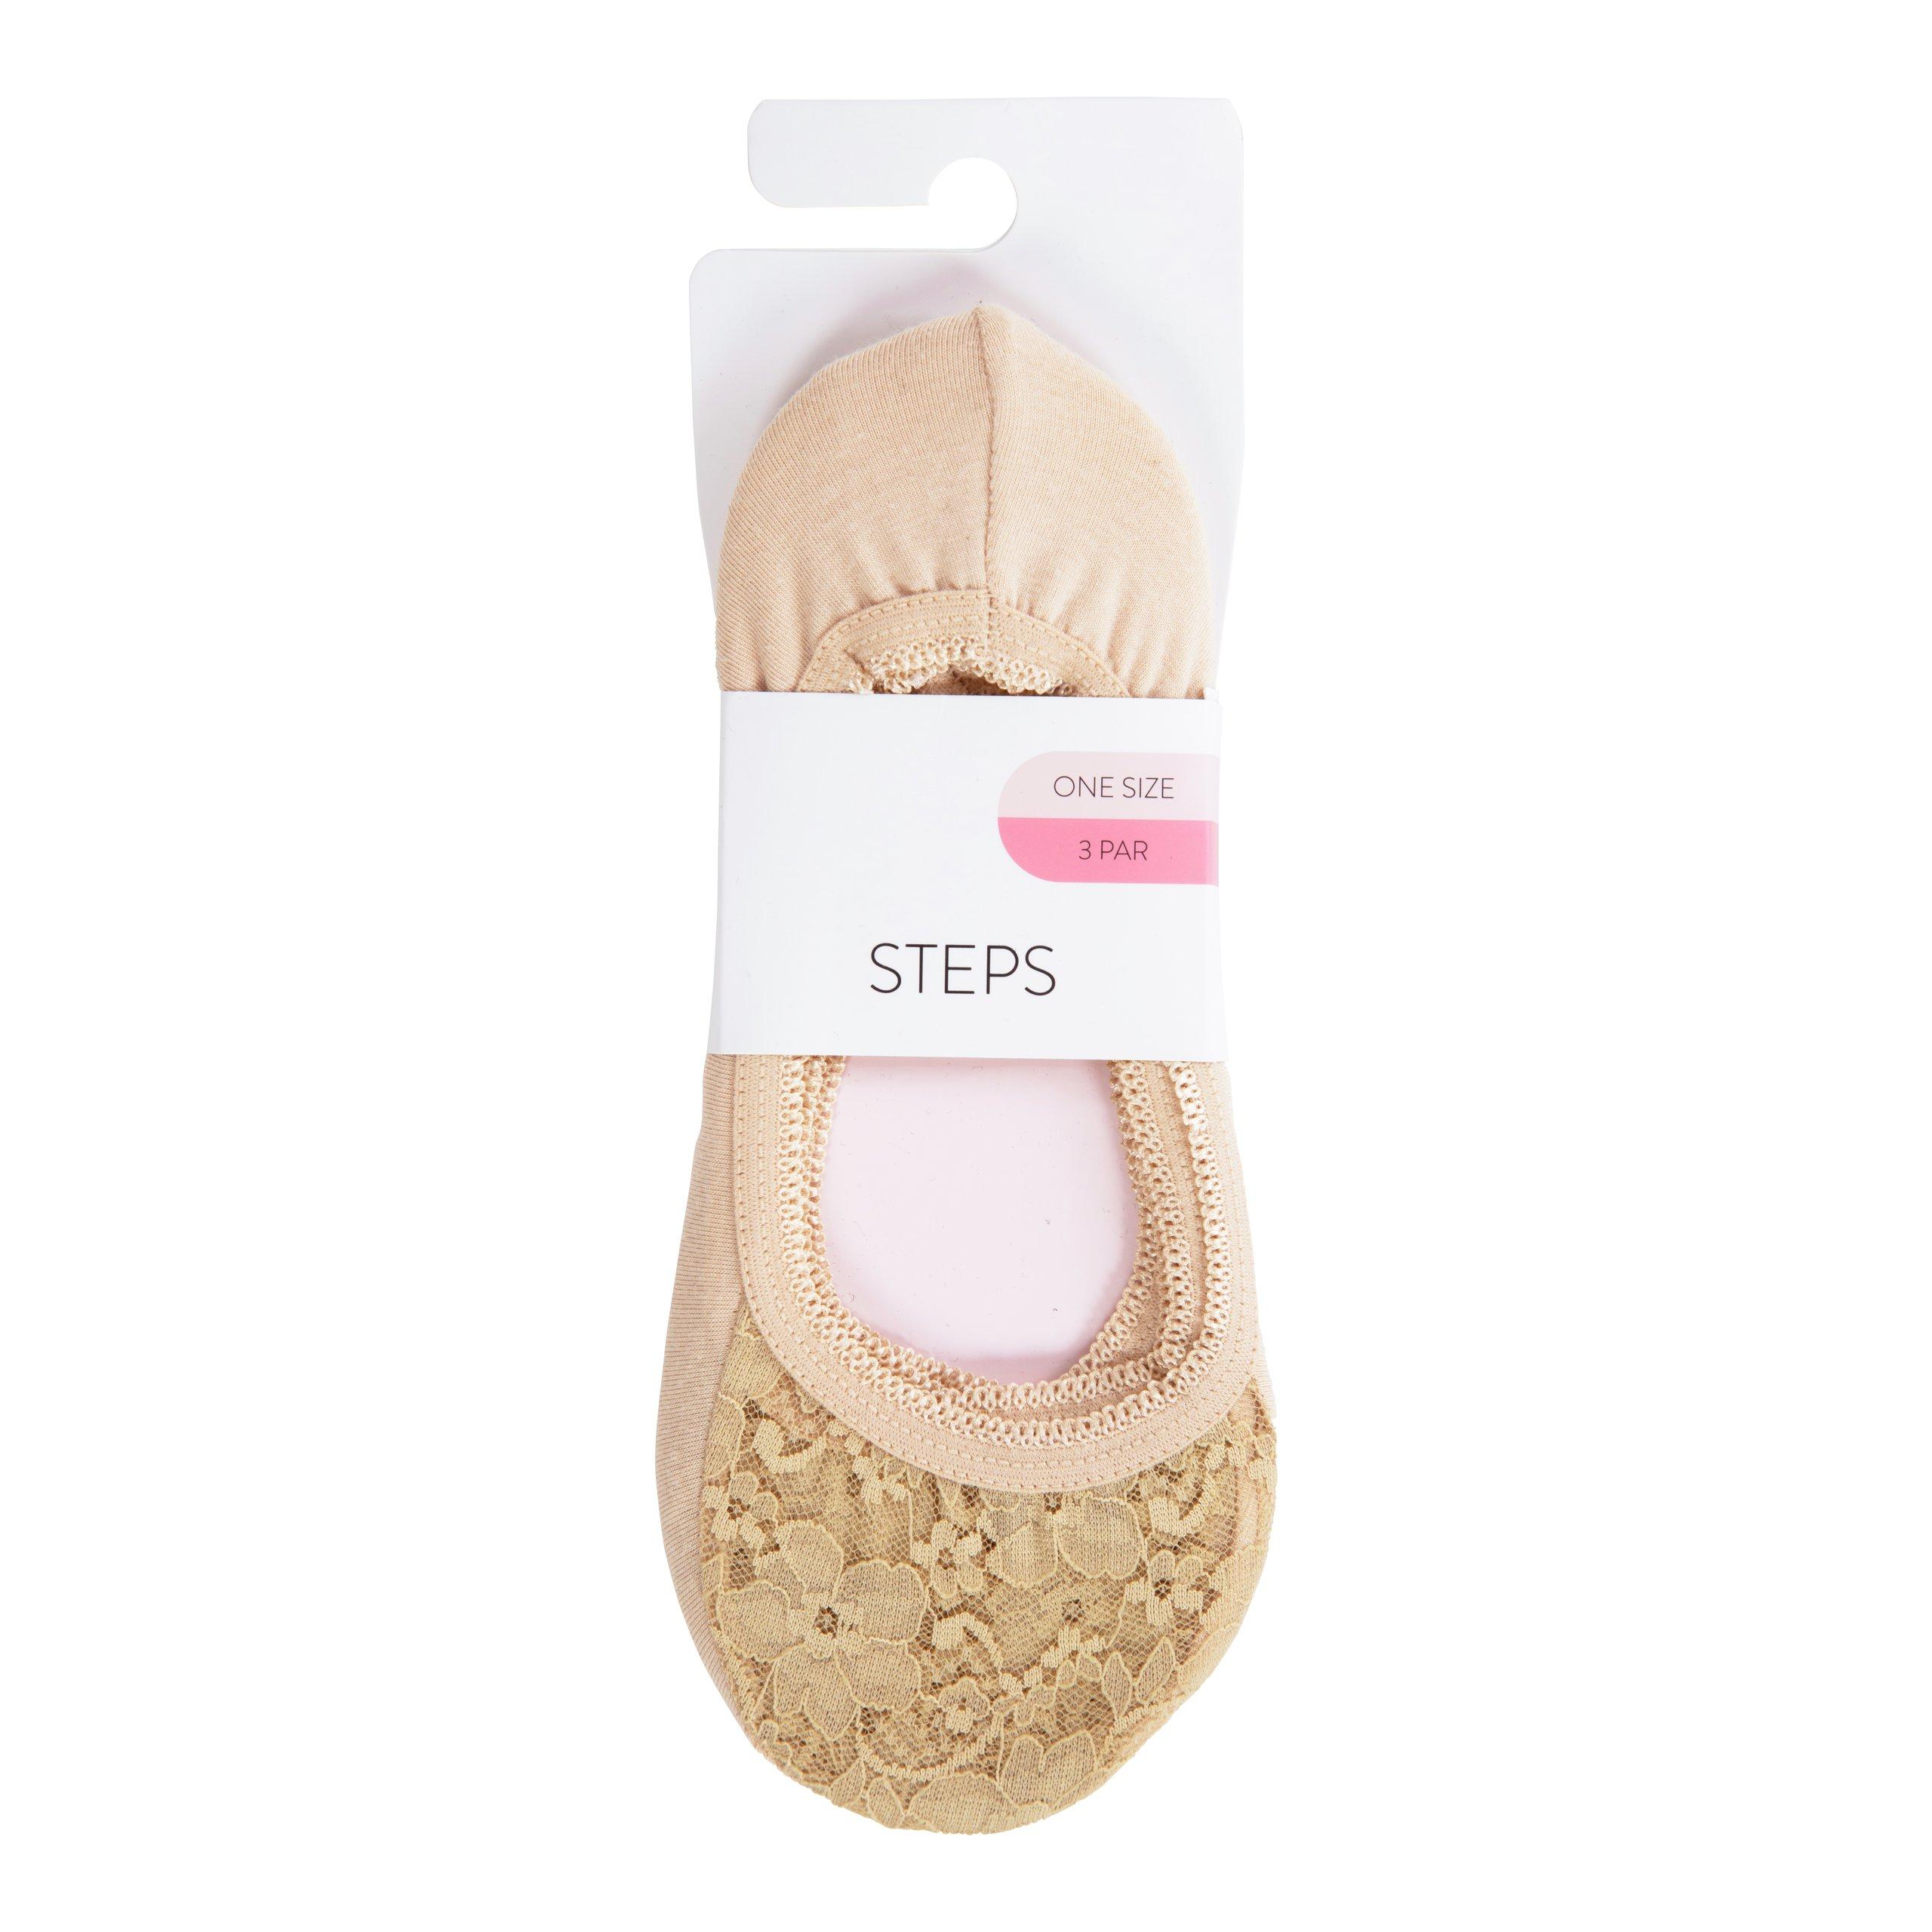 STEPS SOKKER M/BLONDE 3PK BEIGE-100093